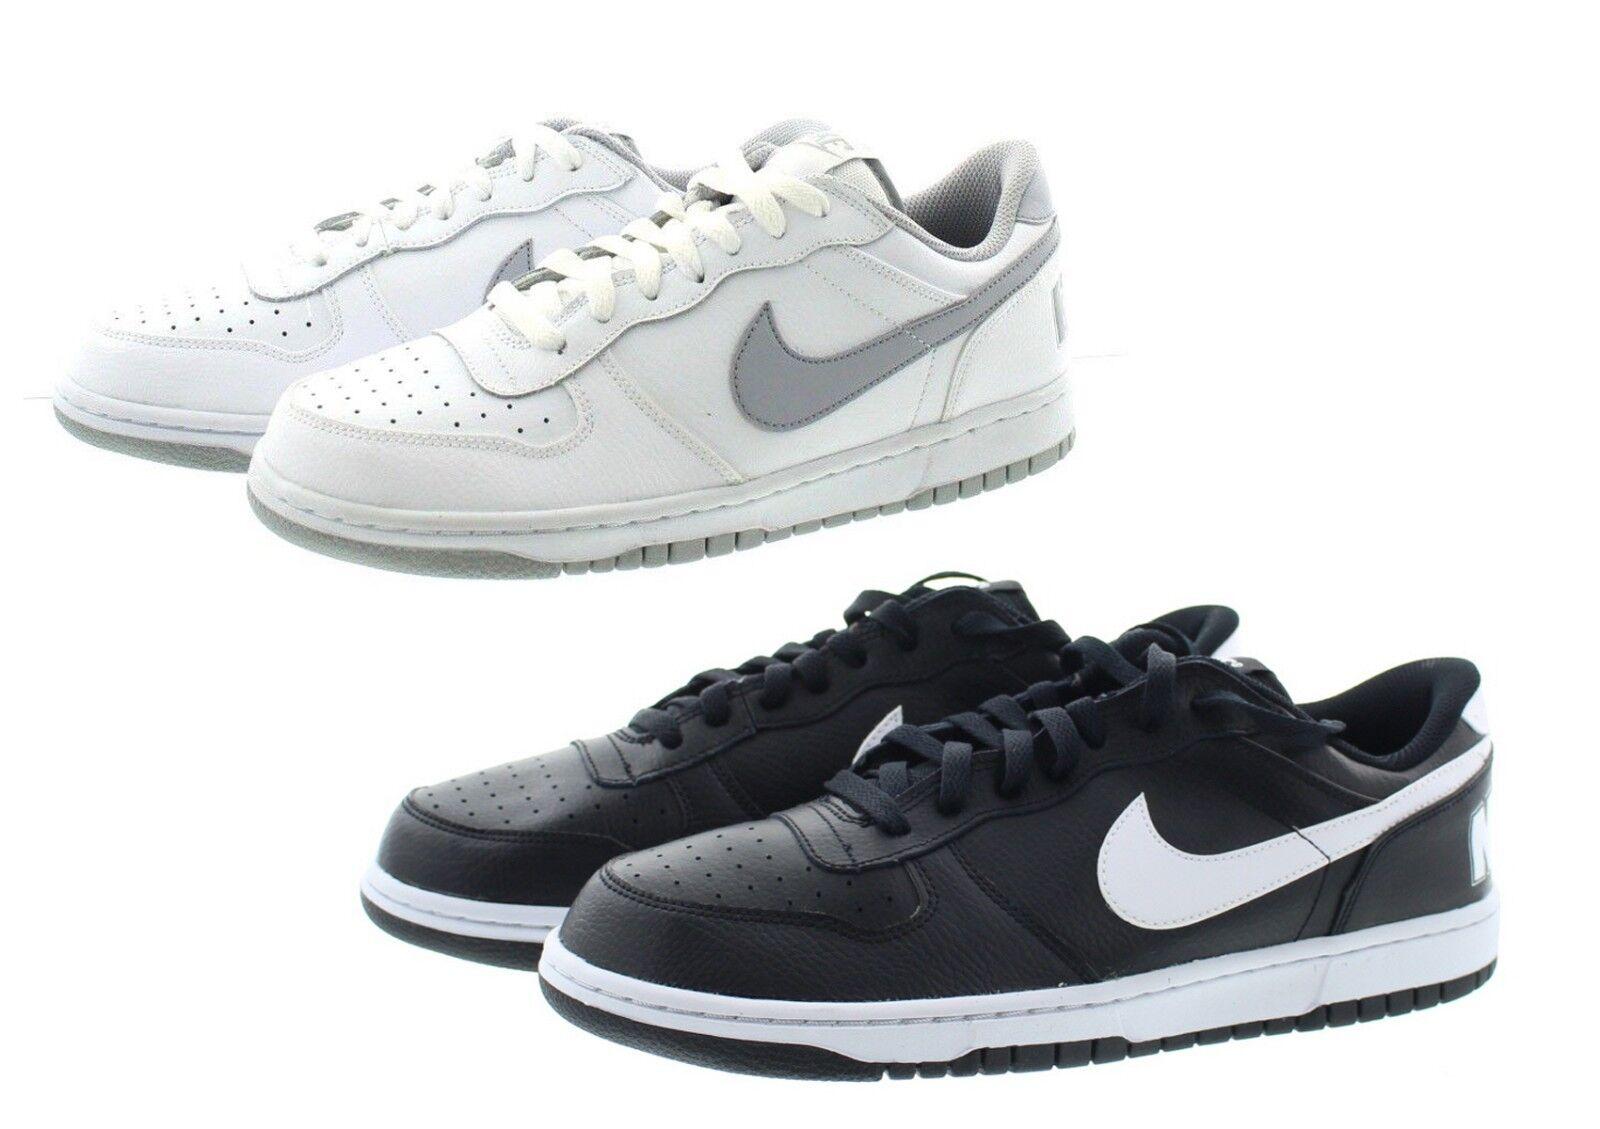 Nike 355152 uomini grande basso alto basket scarpe da ginnastica scarpe nere 016, bianco 106